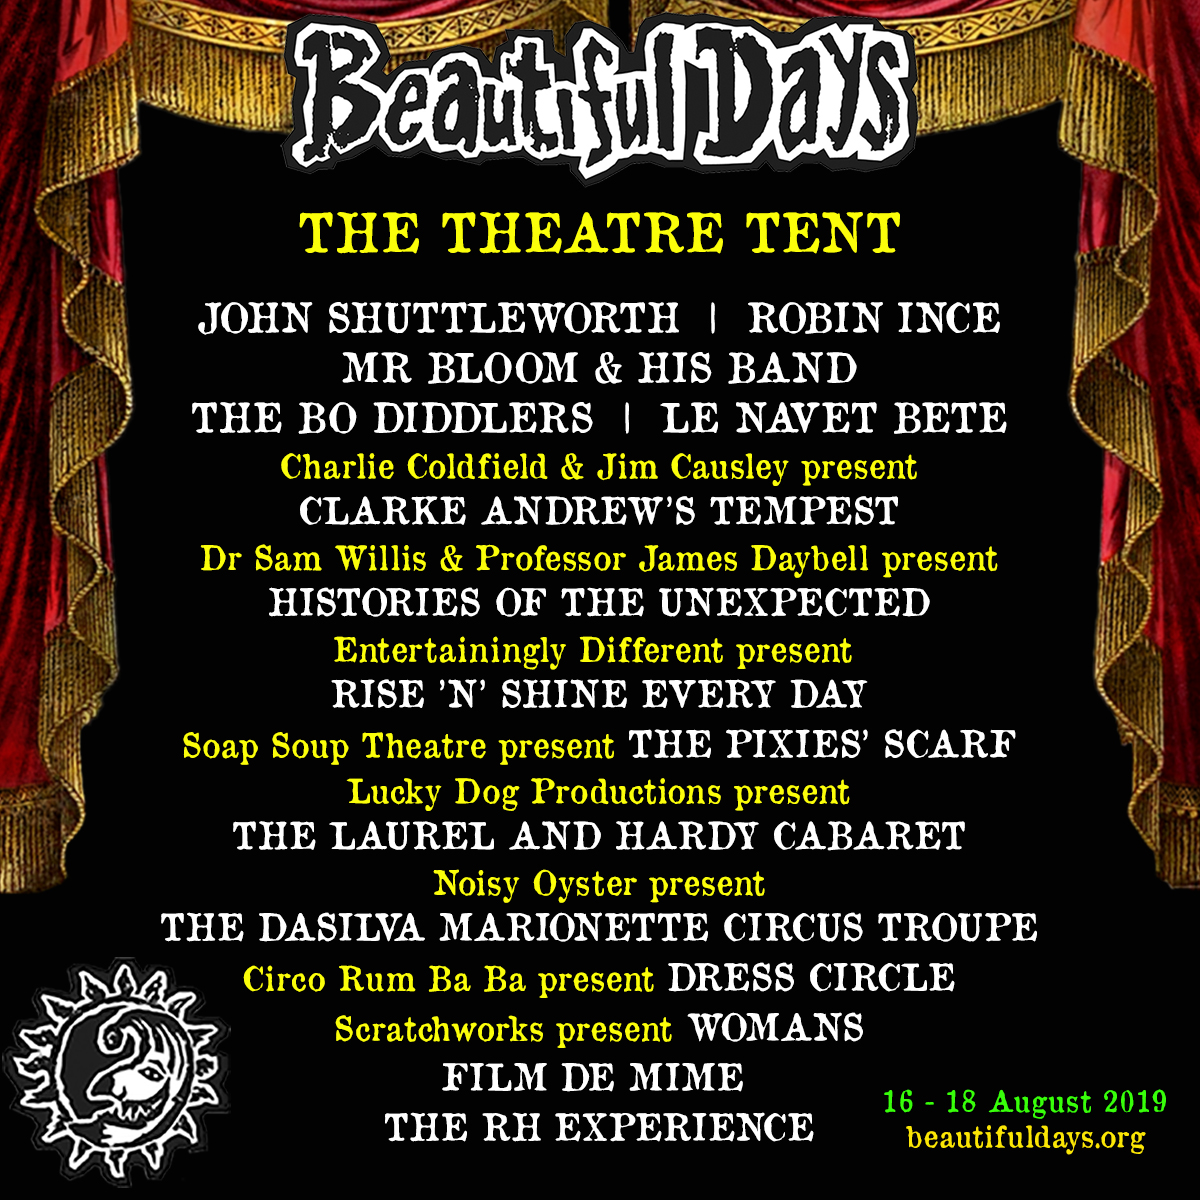 2019 Theatre Tent